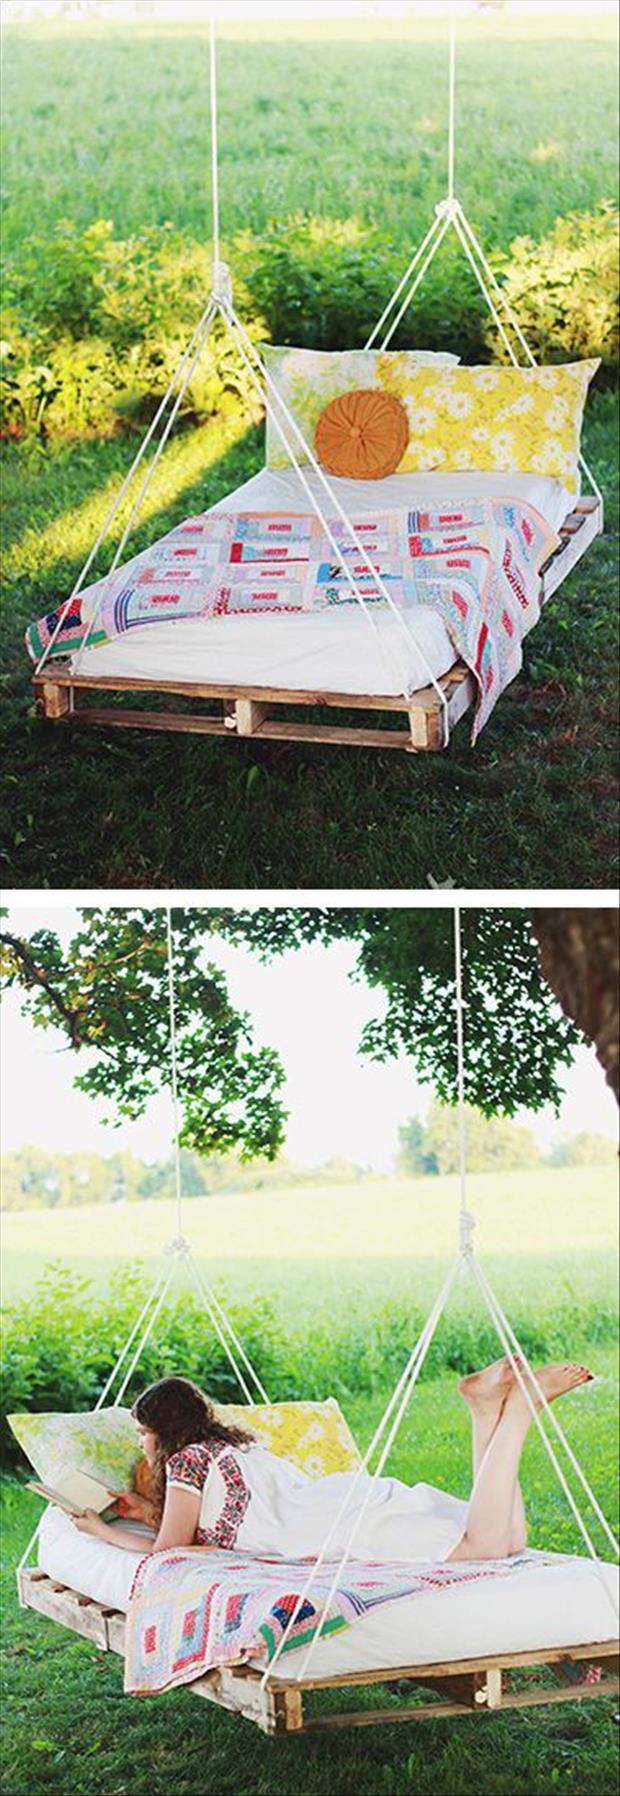 árbol-swings13